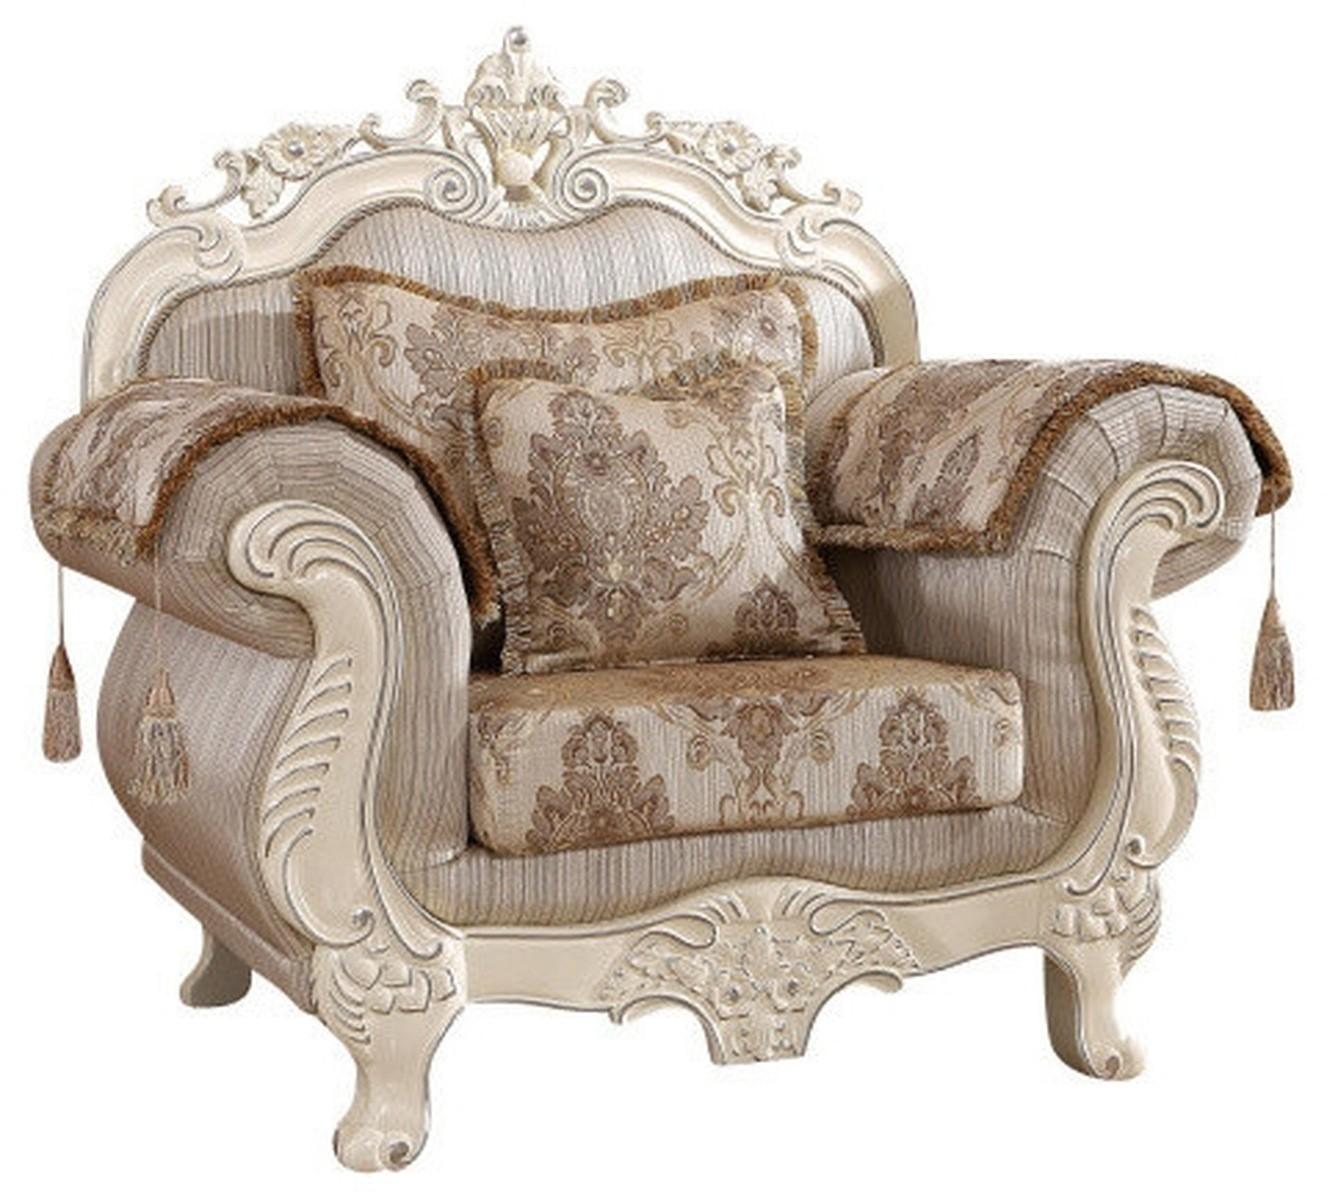 Meridian meridian serena 2 piece living room set in pearl - 8 piece living room furniture set ...